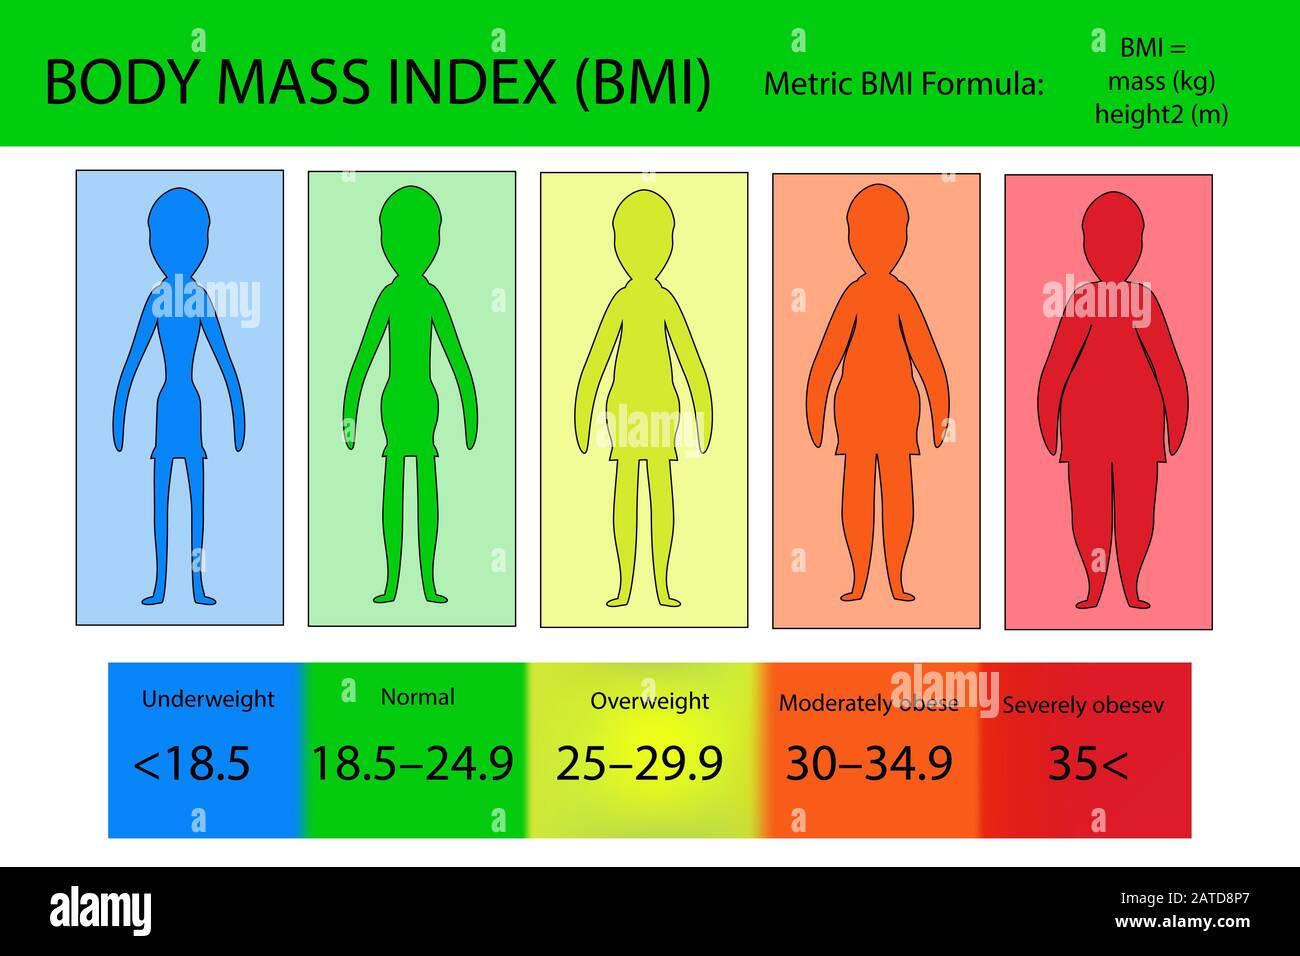 Frau 5 bmi 24 BMI berechnen: